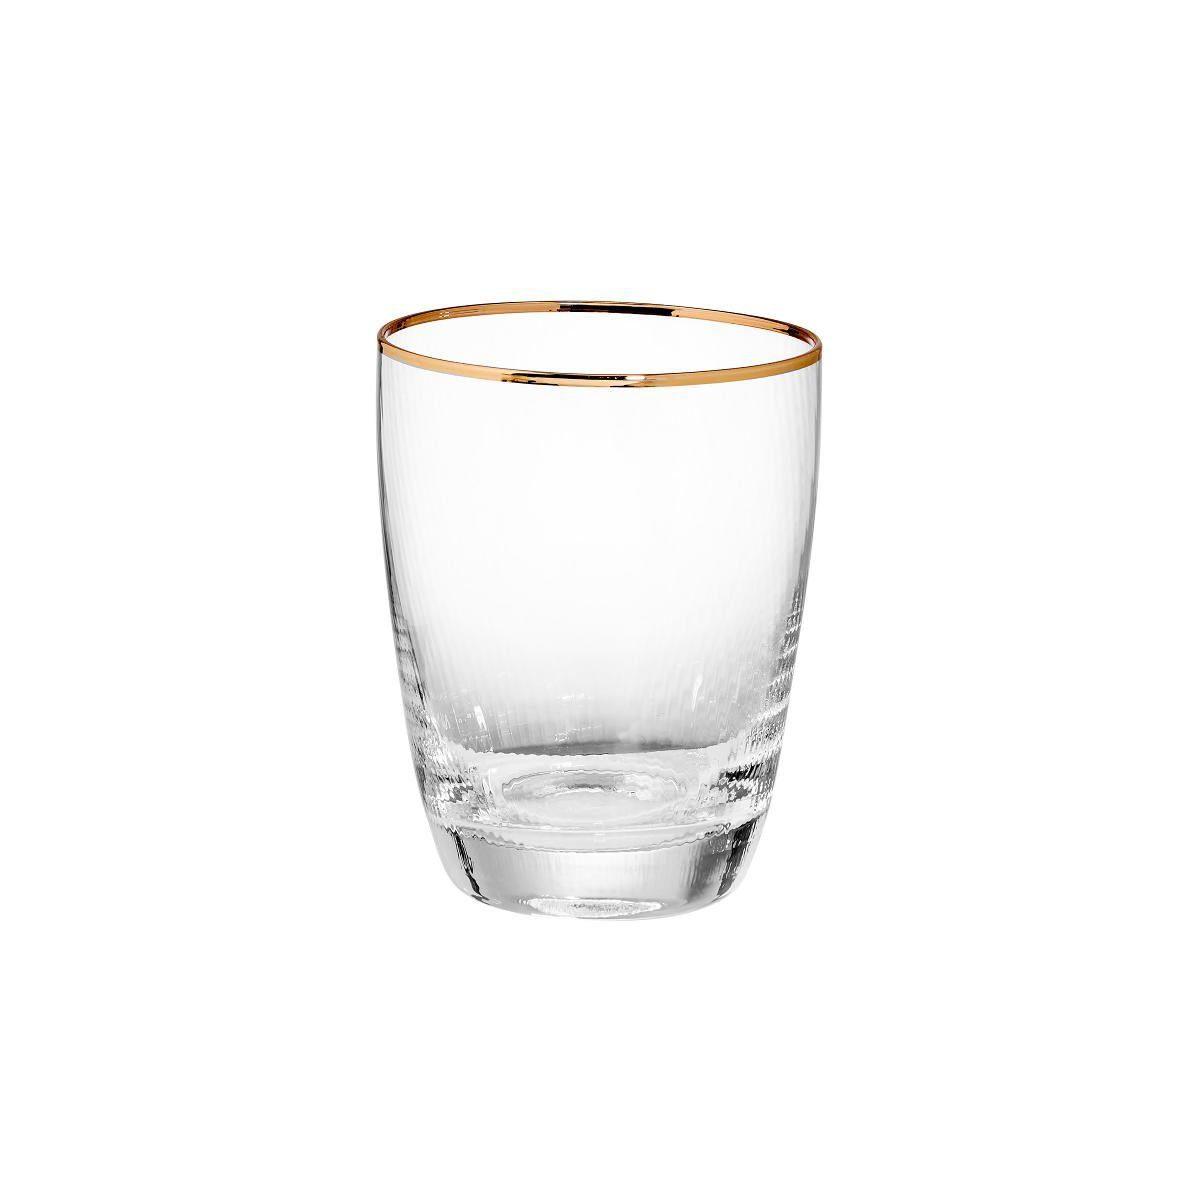 BUTLERS GOLDEN TWENTIES »Wasserglas mit Goldrand 300 ml«